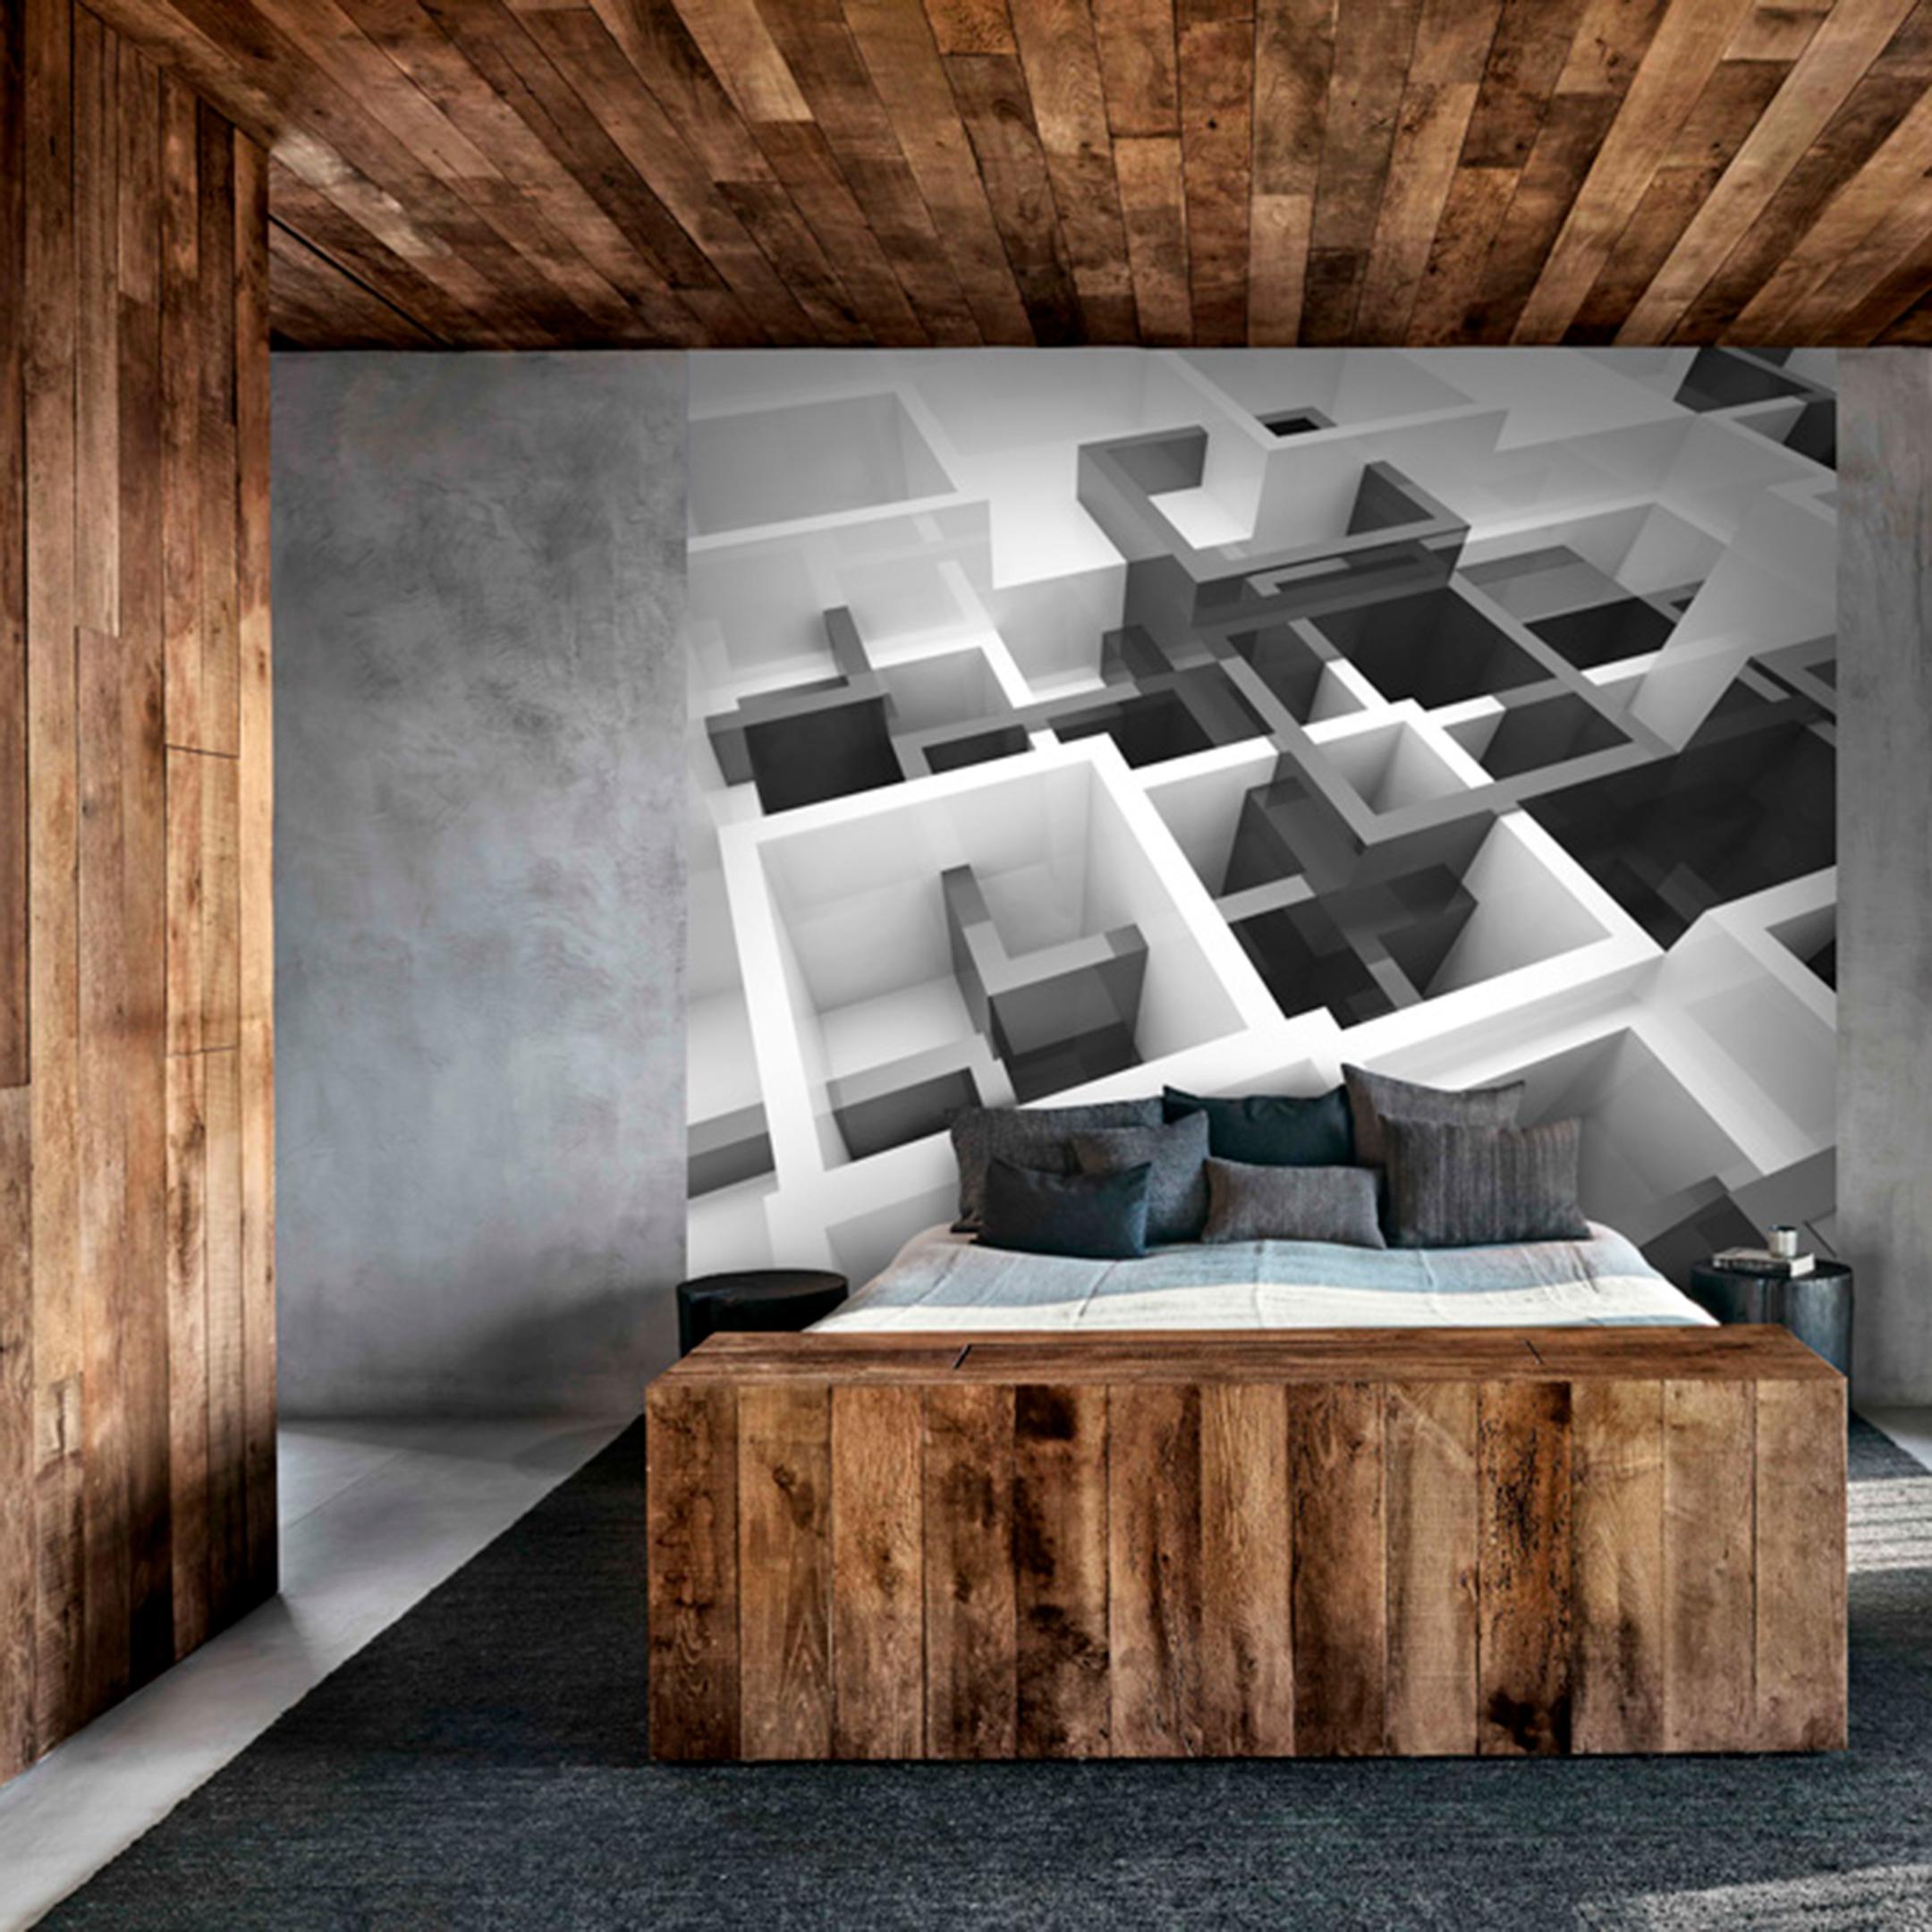 Фотообои Ateliero Черно-белый модерн 30-8144 (3х27 м).